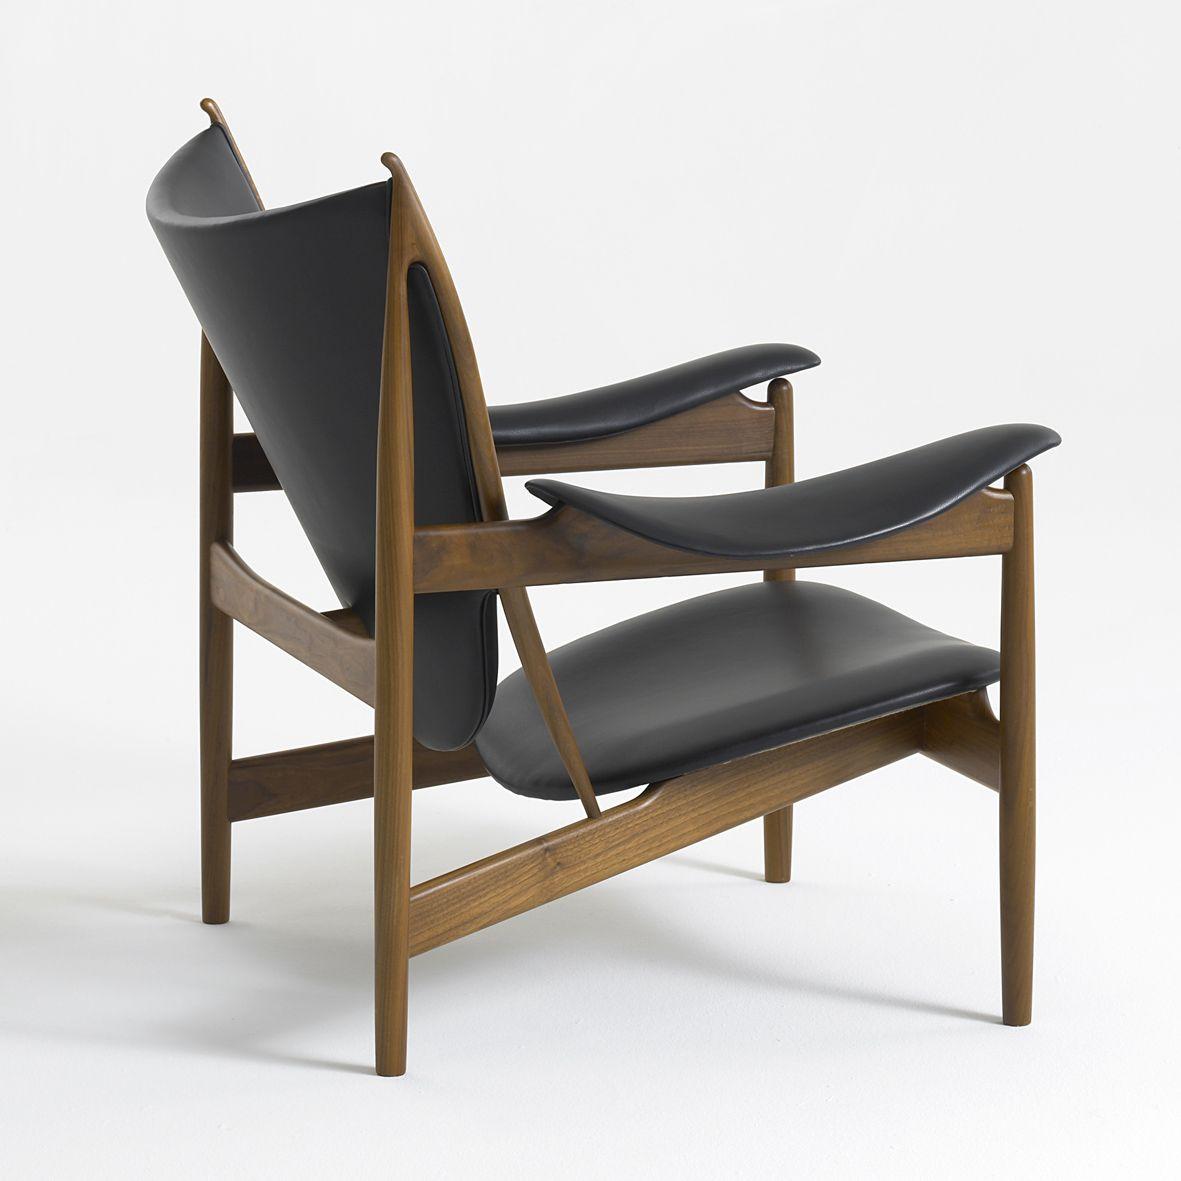 Chieftains Chair by the late Danish designer Finn Juhl.